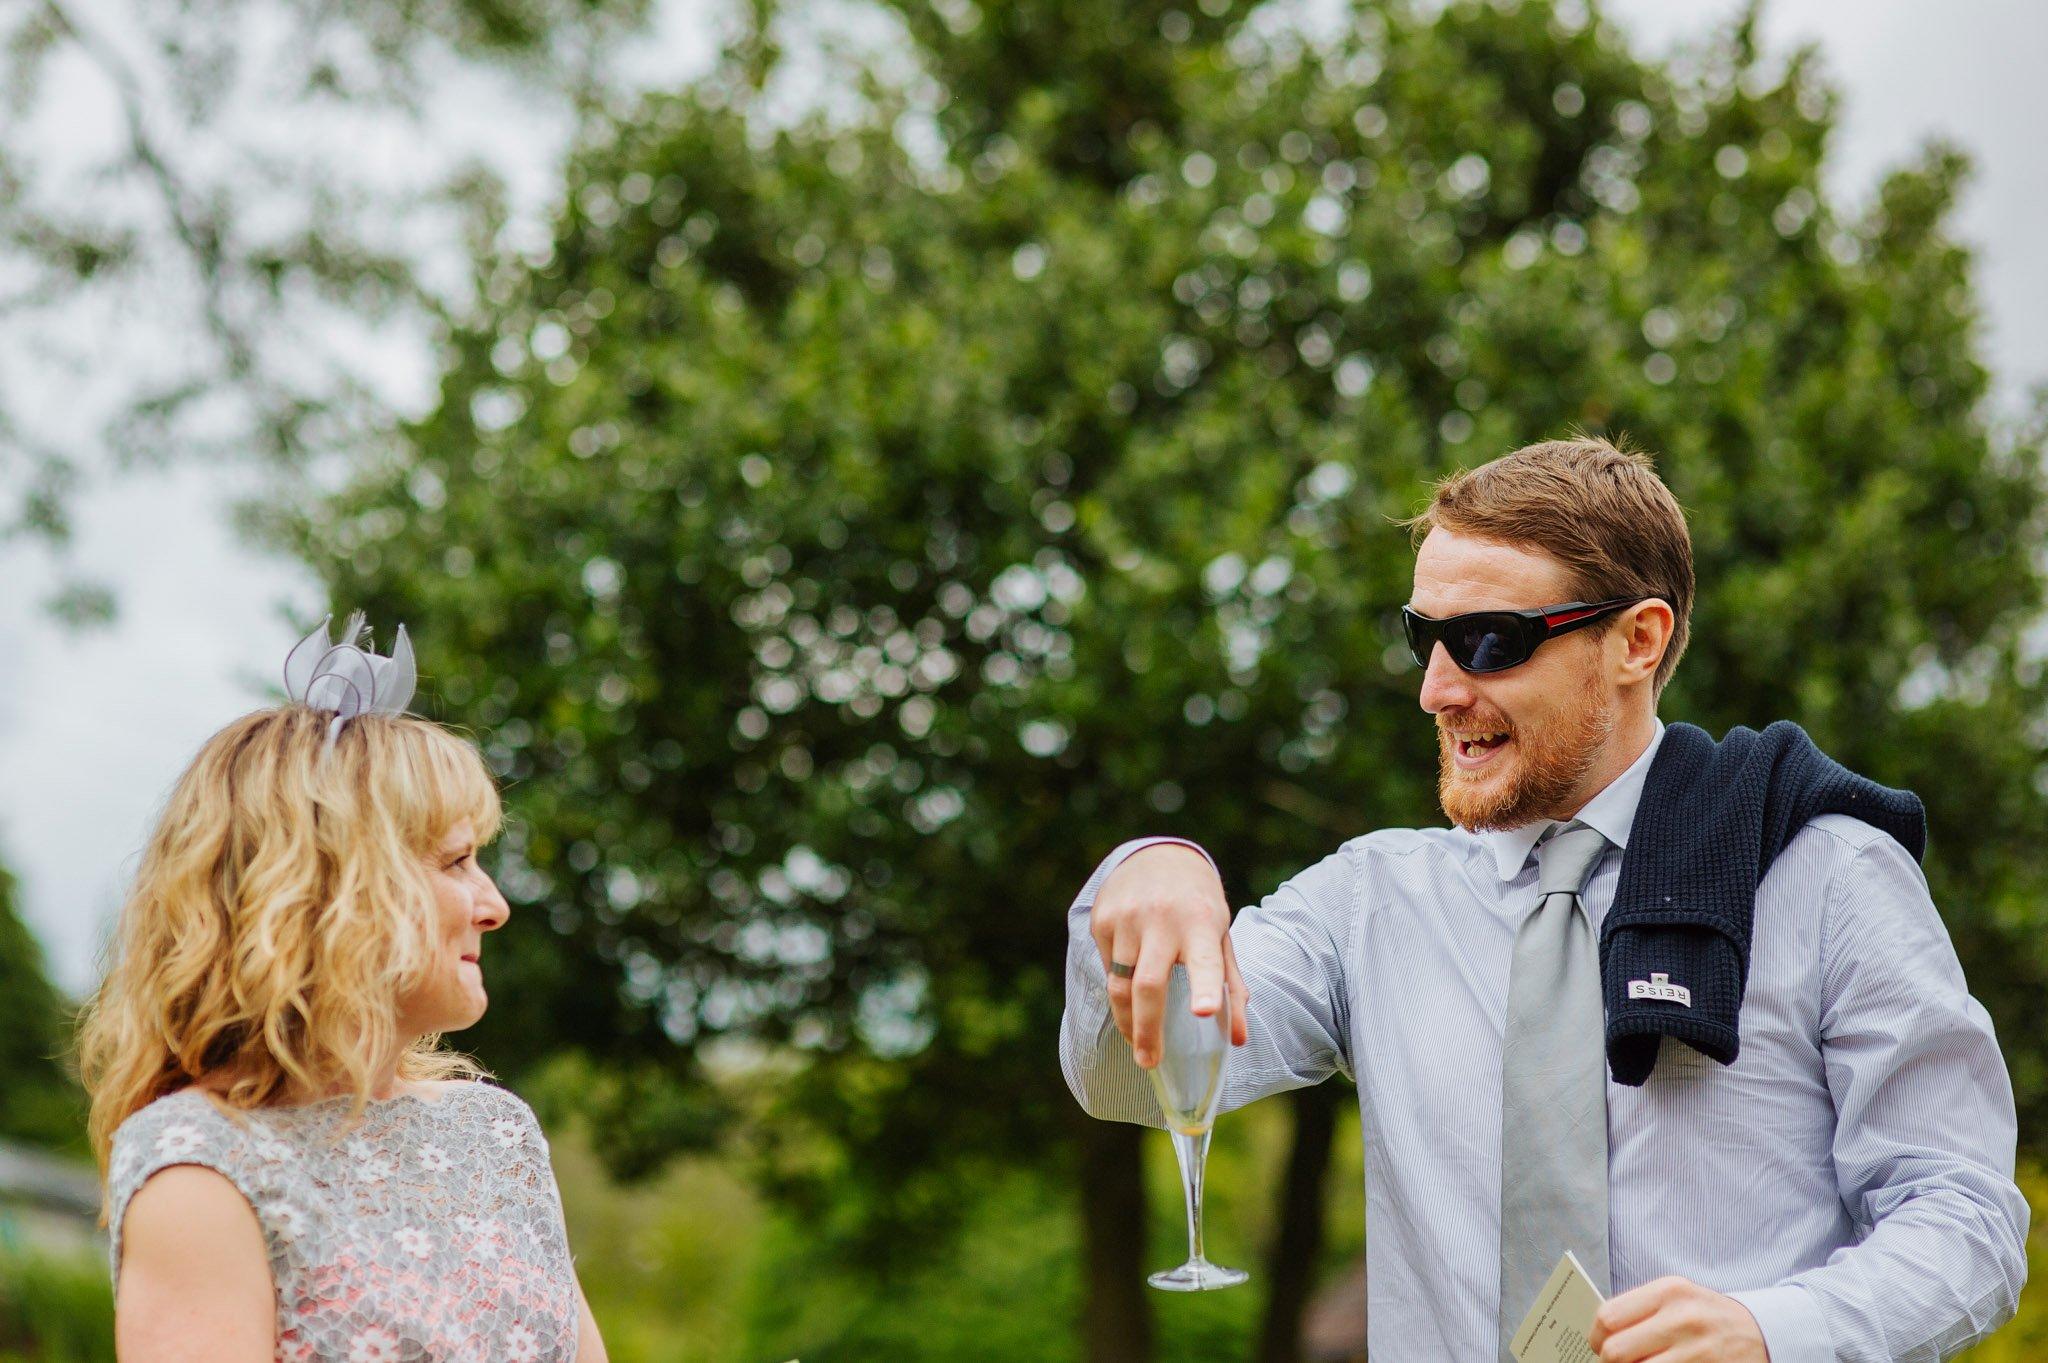 Georgina + Mike - Wedding photography in Malvern, Worcestershire 43